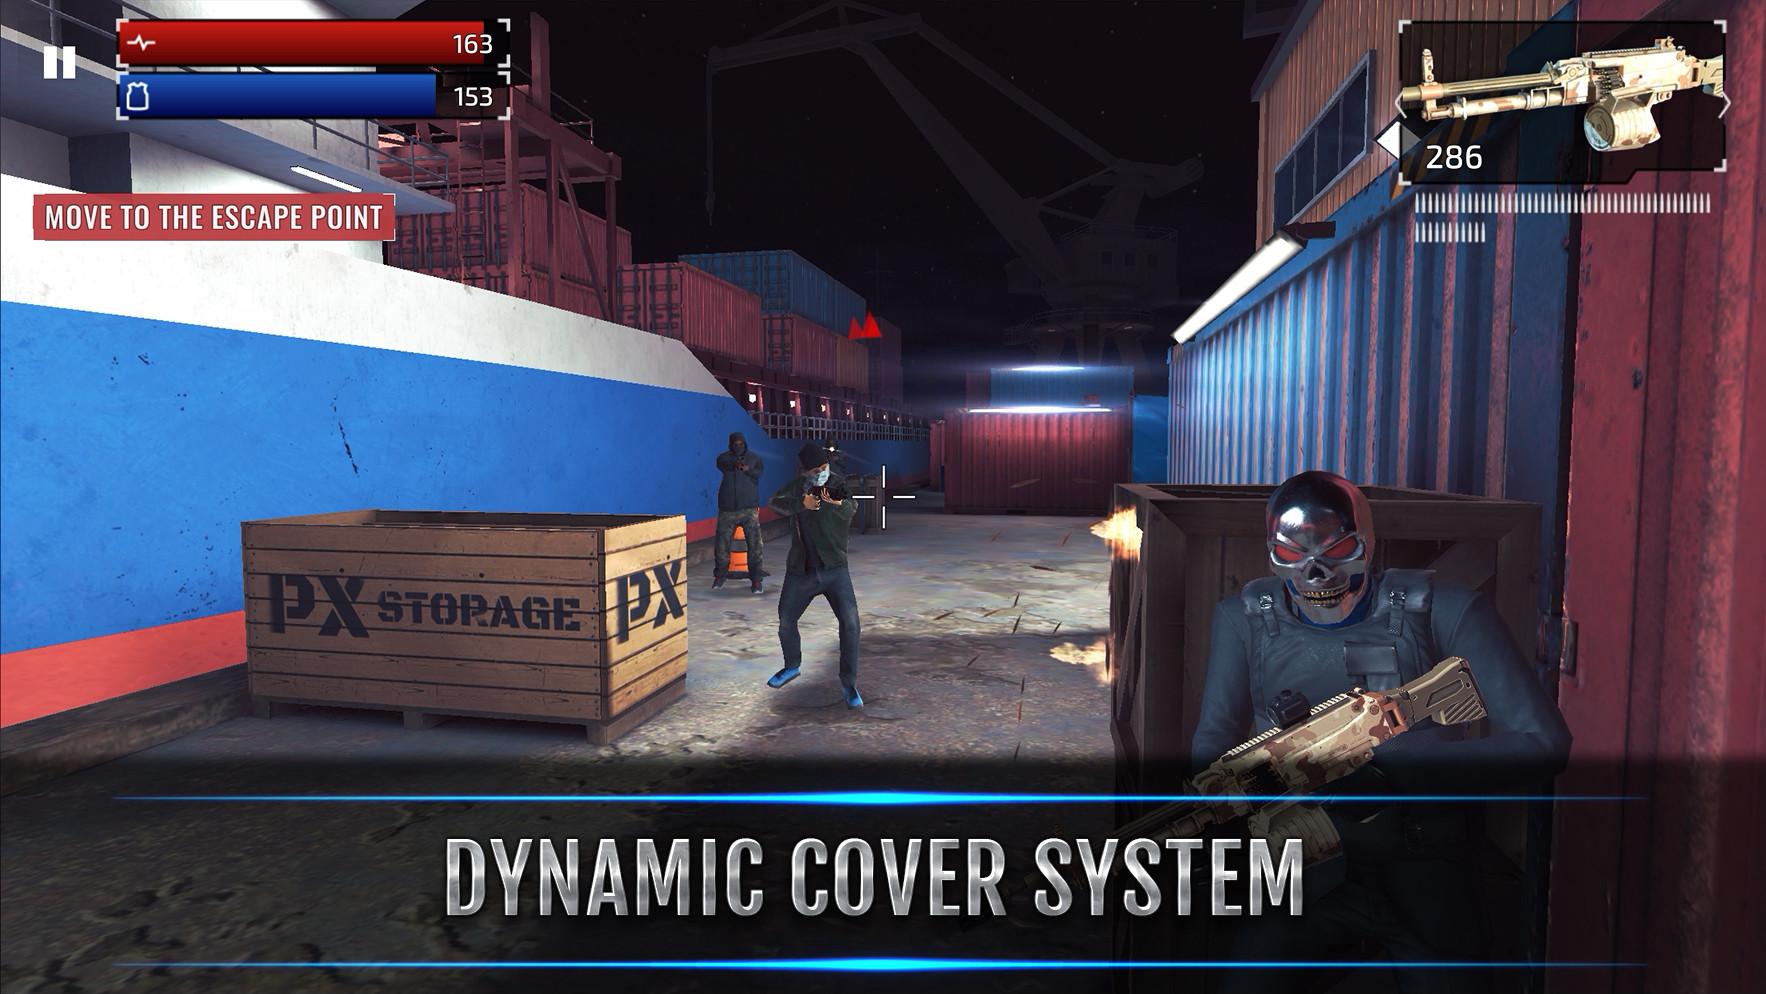 DynamicCoverSystem.jpg.d05fd5f17a3b02a4abe50cd5f09e24d9.jpg